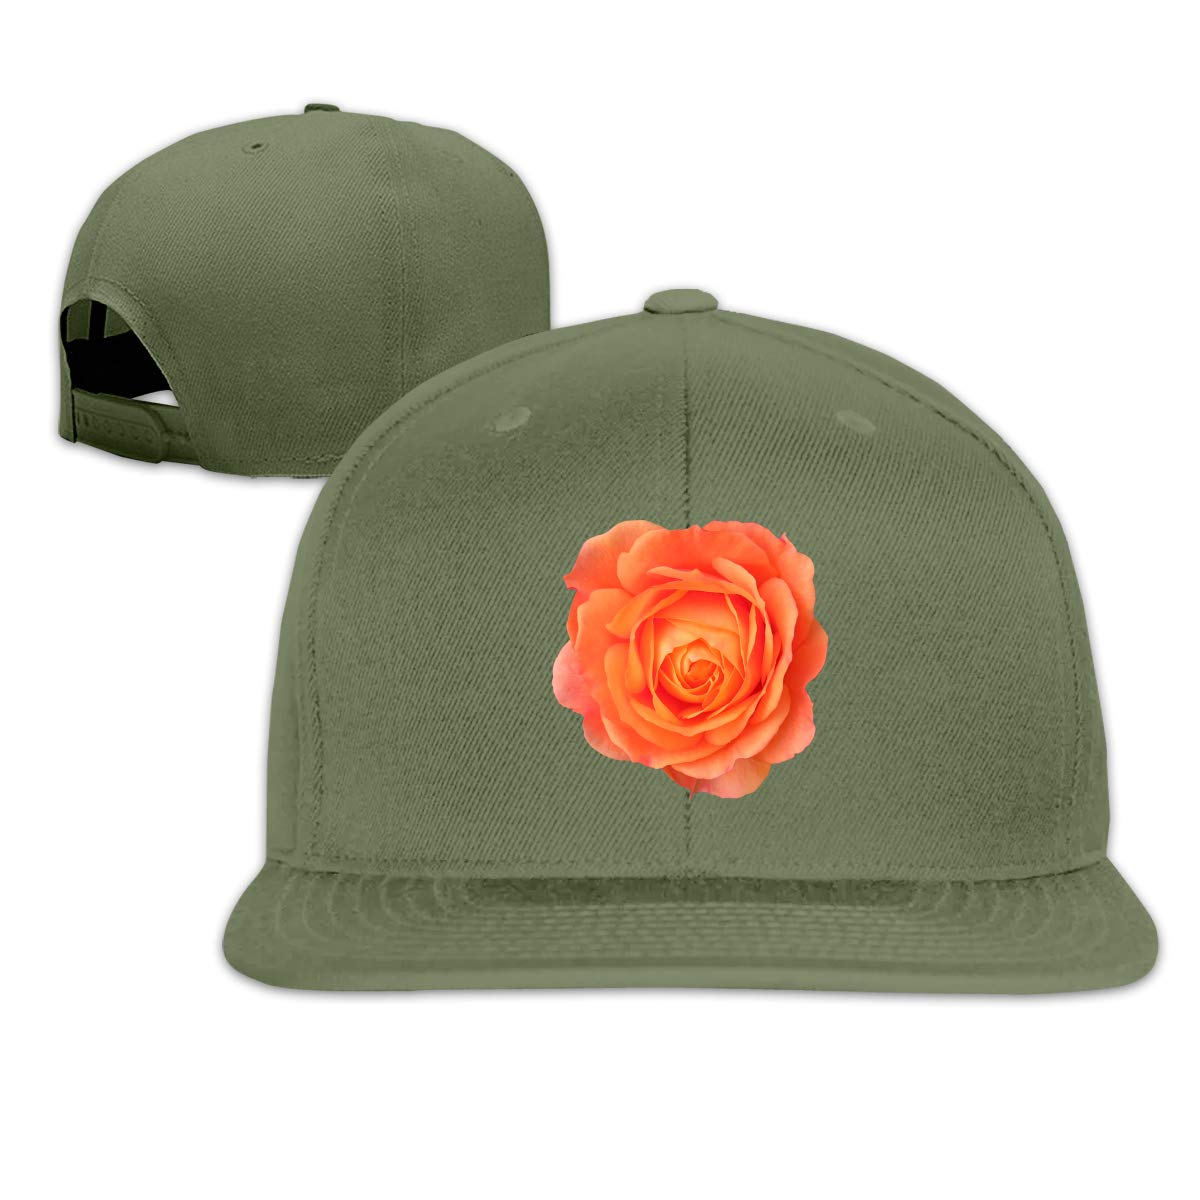 Xieadery 3D Flower Rose Flat Brim Baseball Cap Adjustable Snapback Trucker Hat Caps Hip Hop Hat